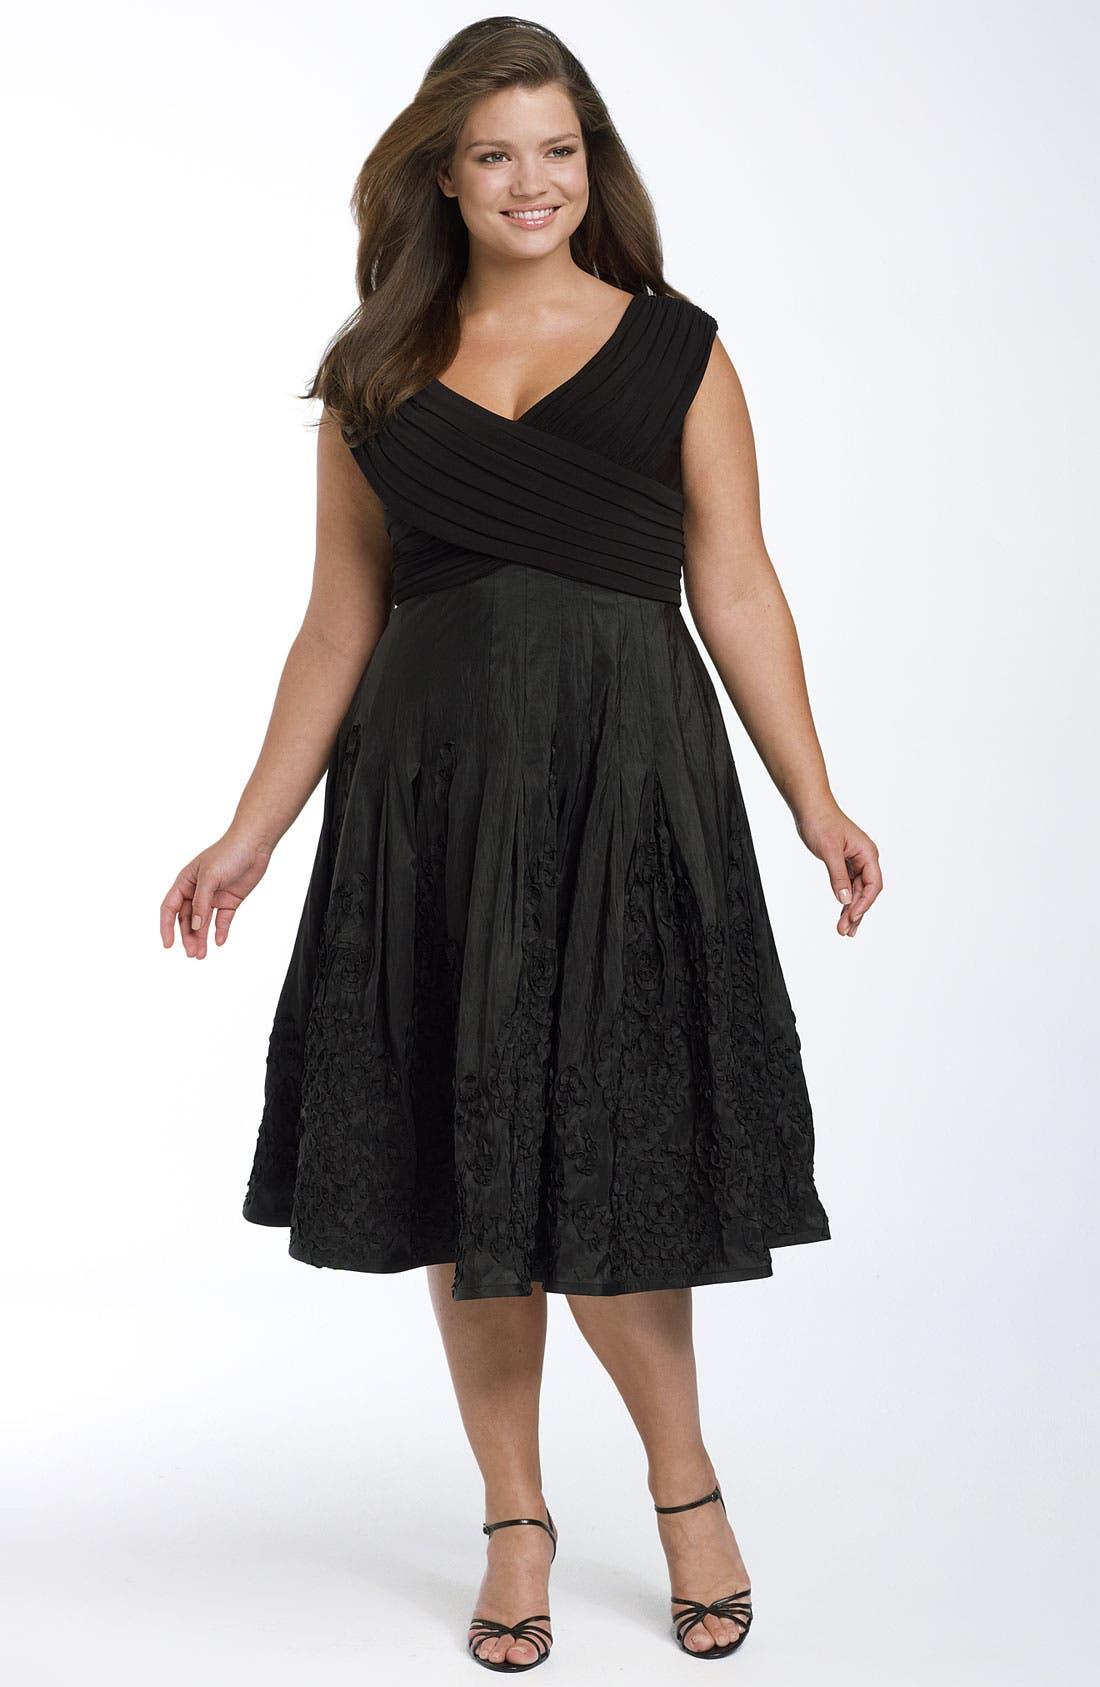 Alternate Image 1 Selected - Adrianna Papell Matte Jersey & Taffeta Party Dress (Plus)